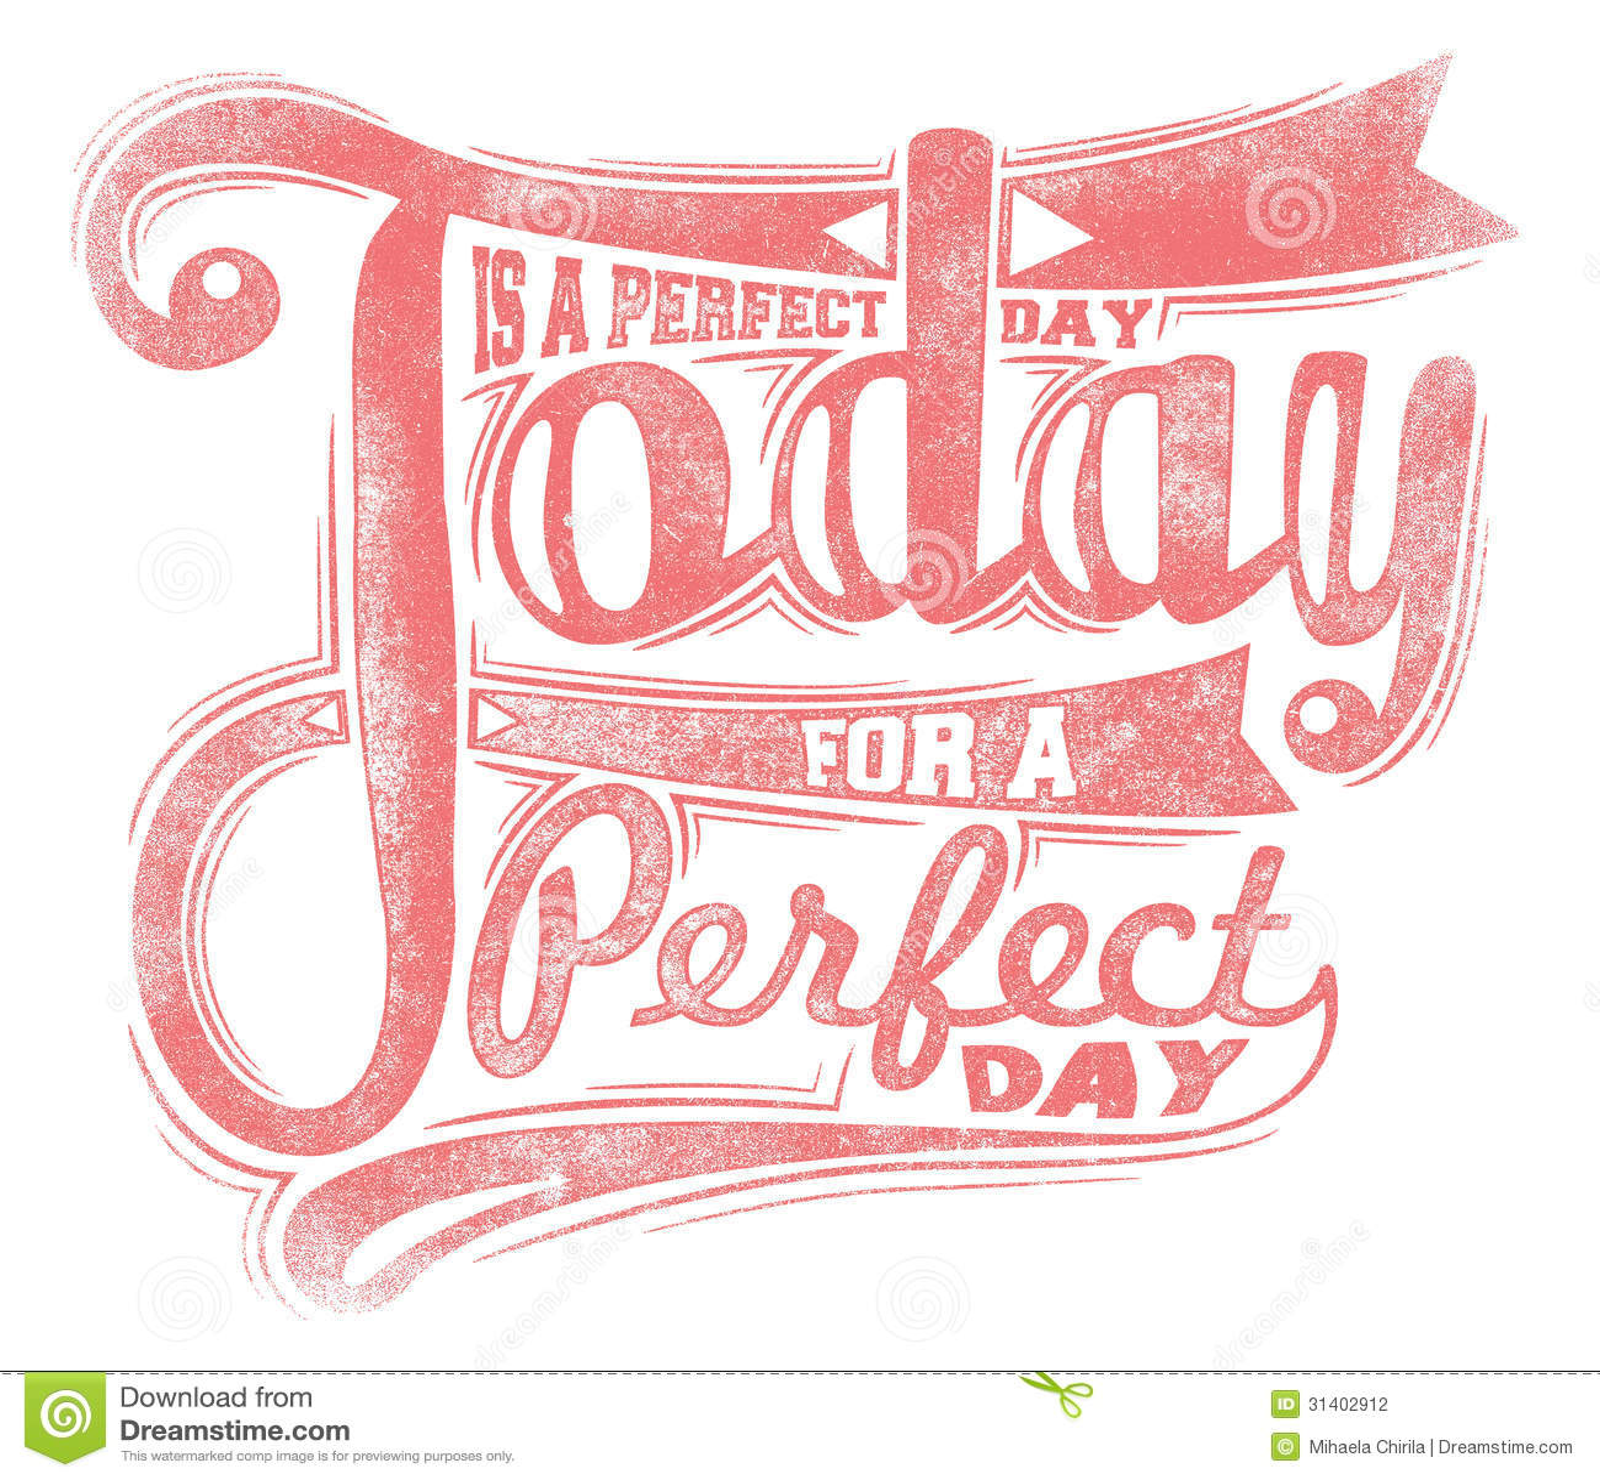 Heutiger Tag Ist Ein Perfekter Tag Vektor Abbildung - Illustration ...